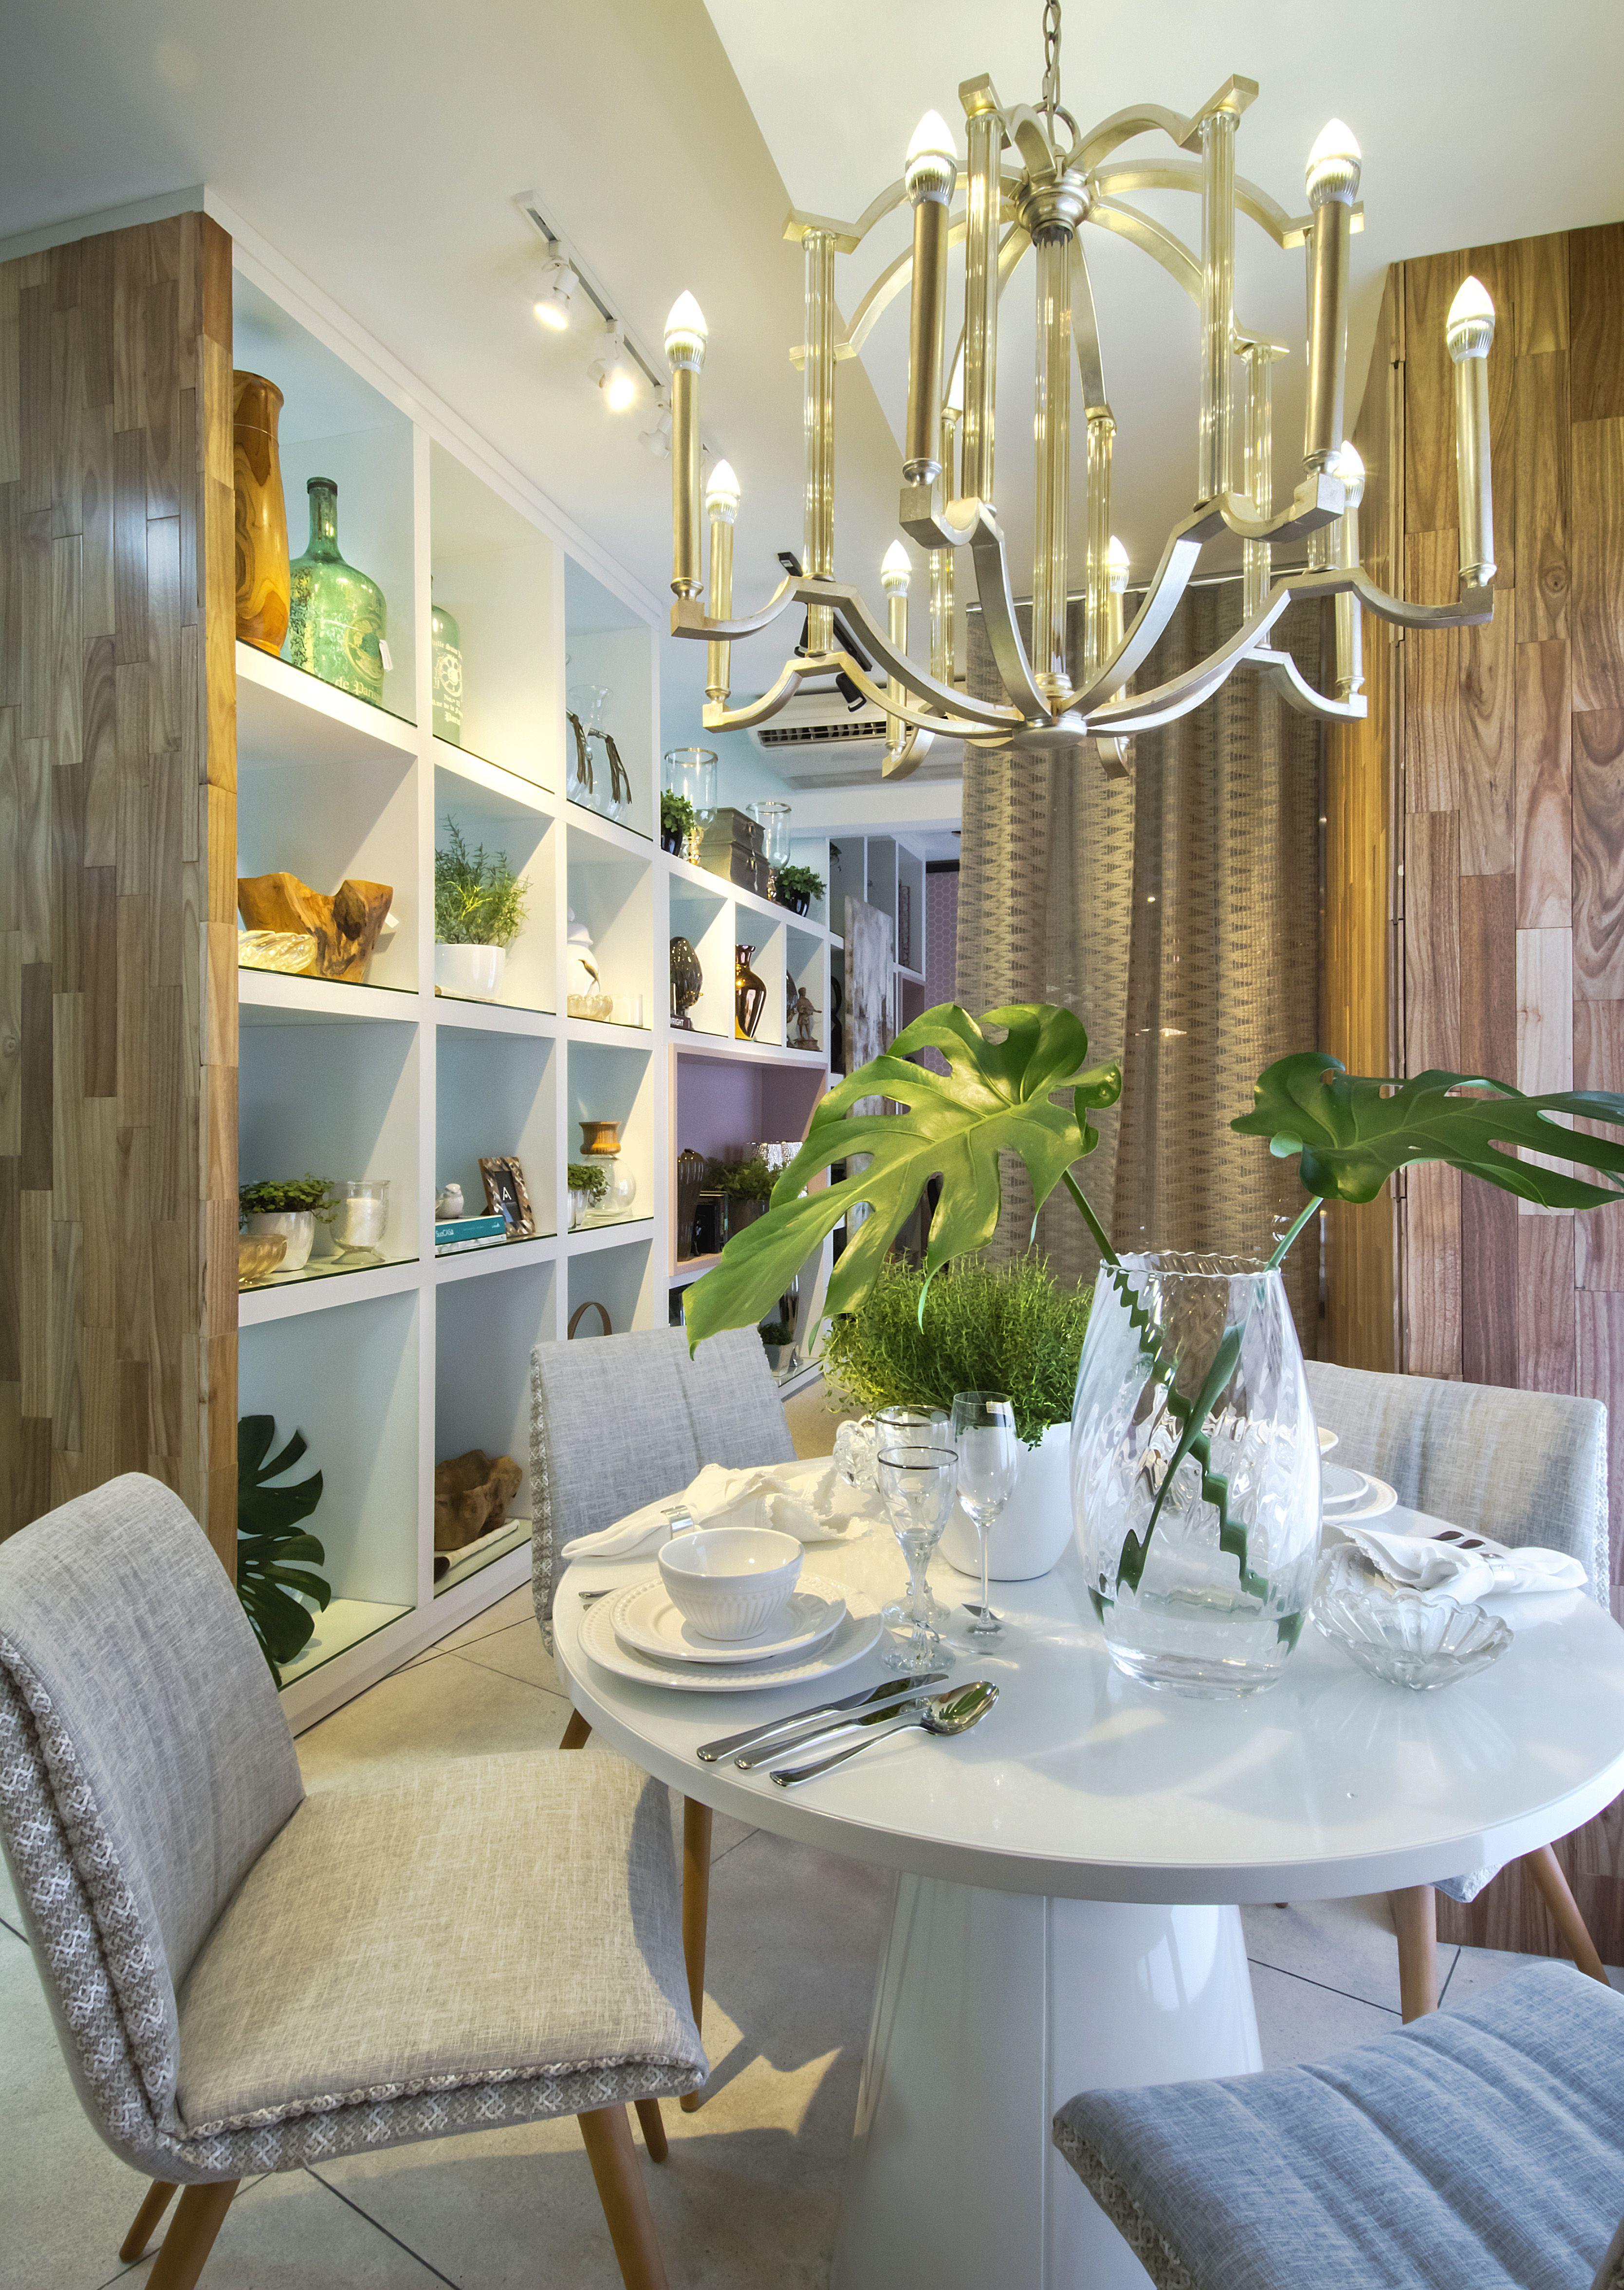 Projeto de Interiores para vitrine da loja Arte & Requinte 2016 - Brusque - Santa Catarina - Foto Cícero Viégas